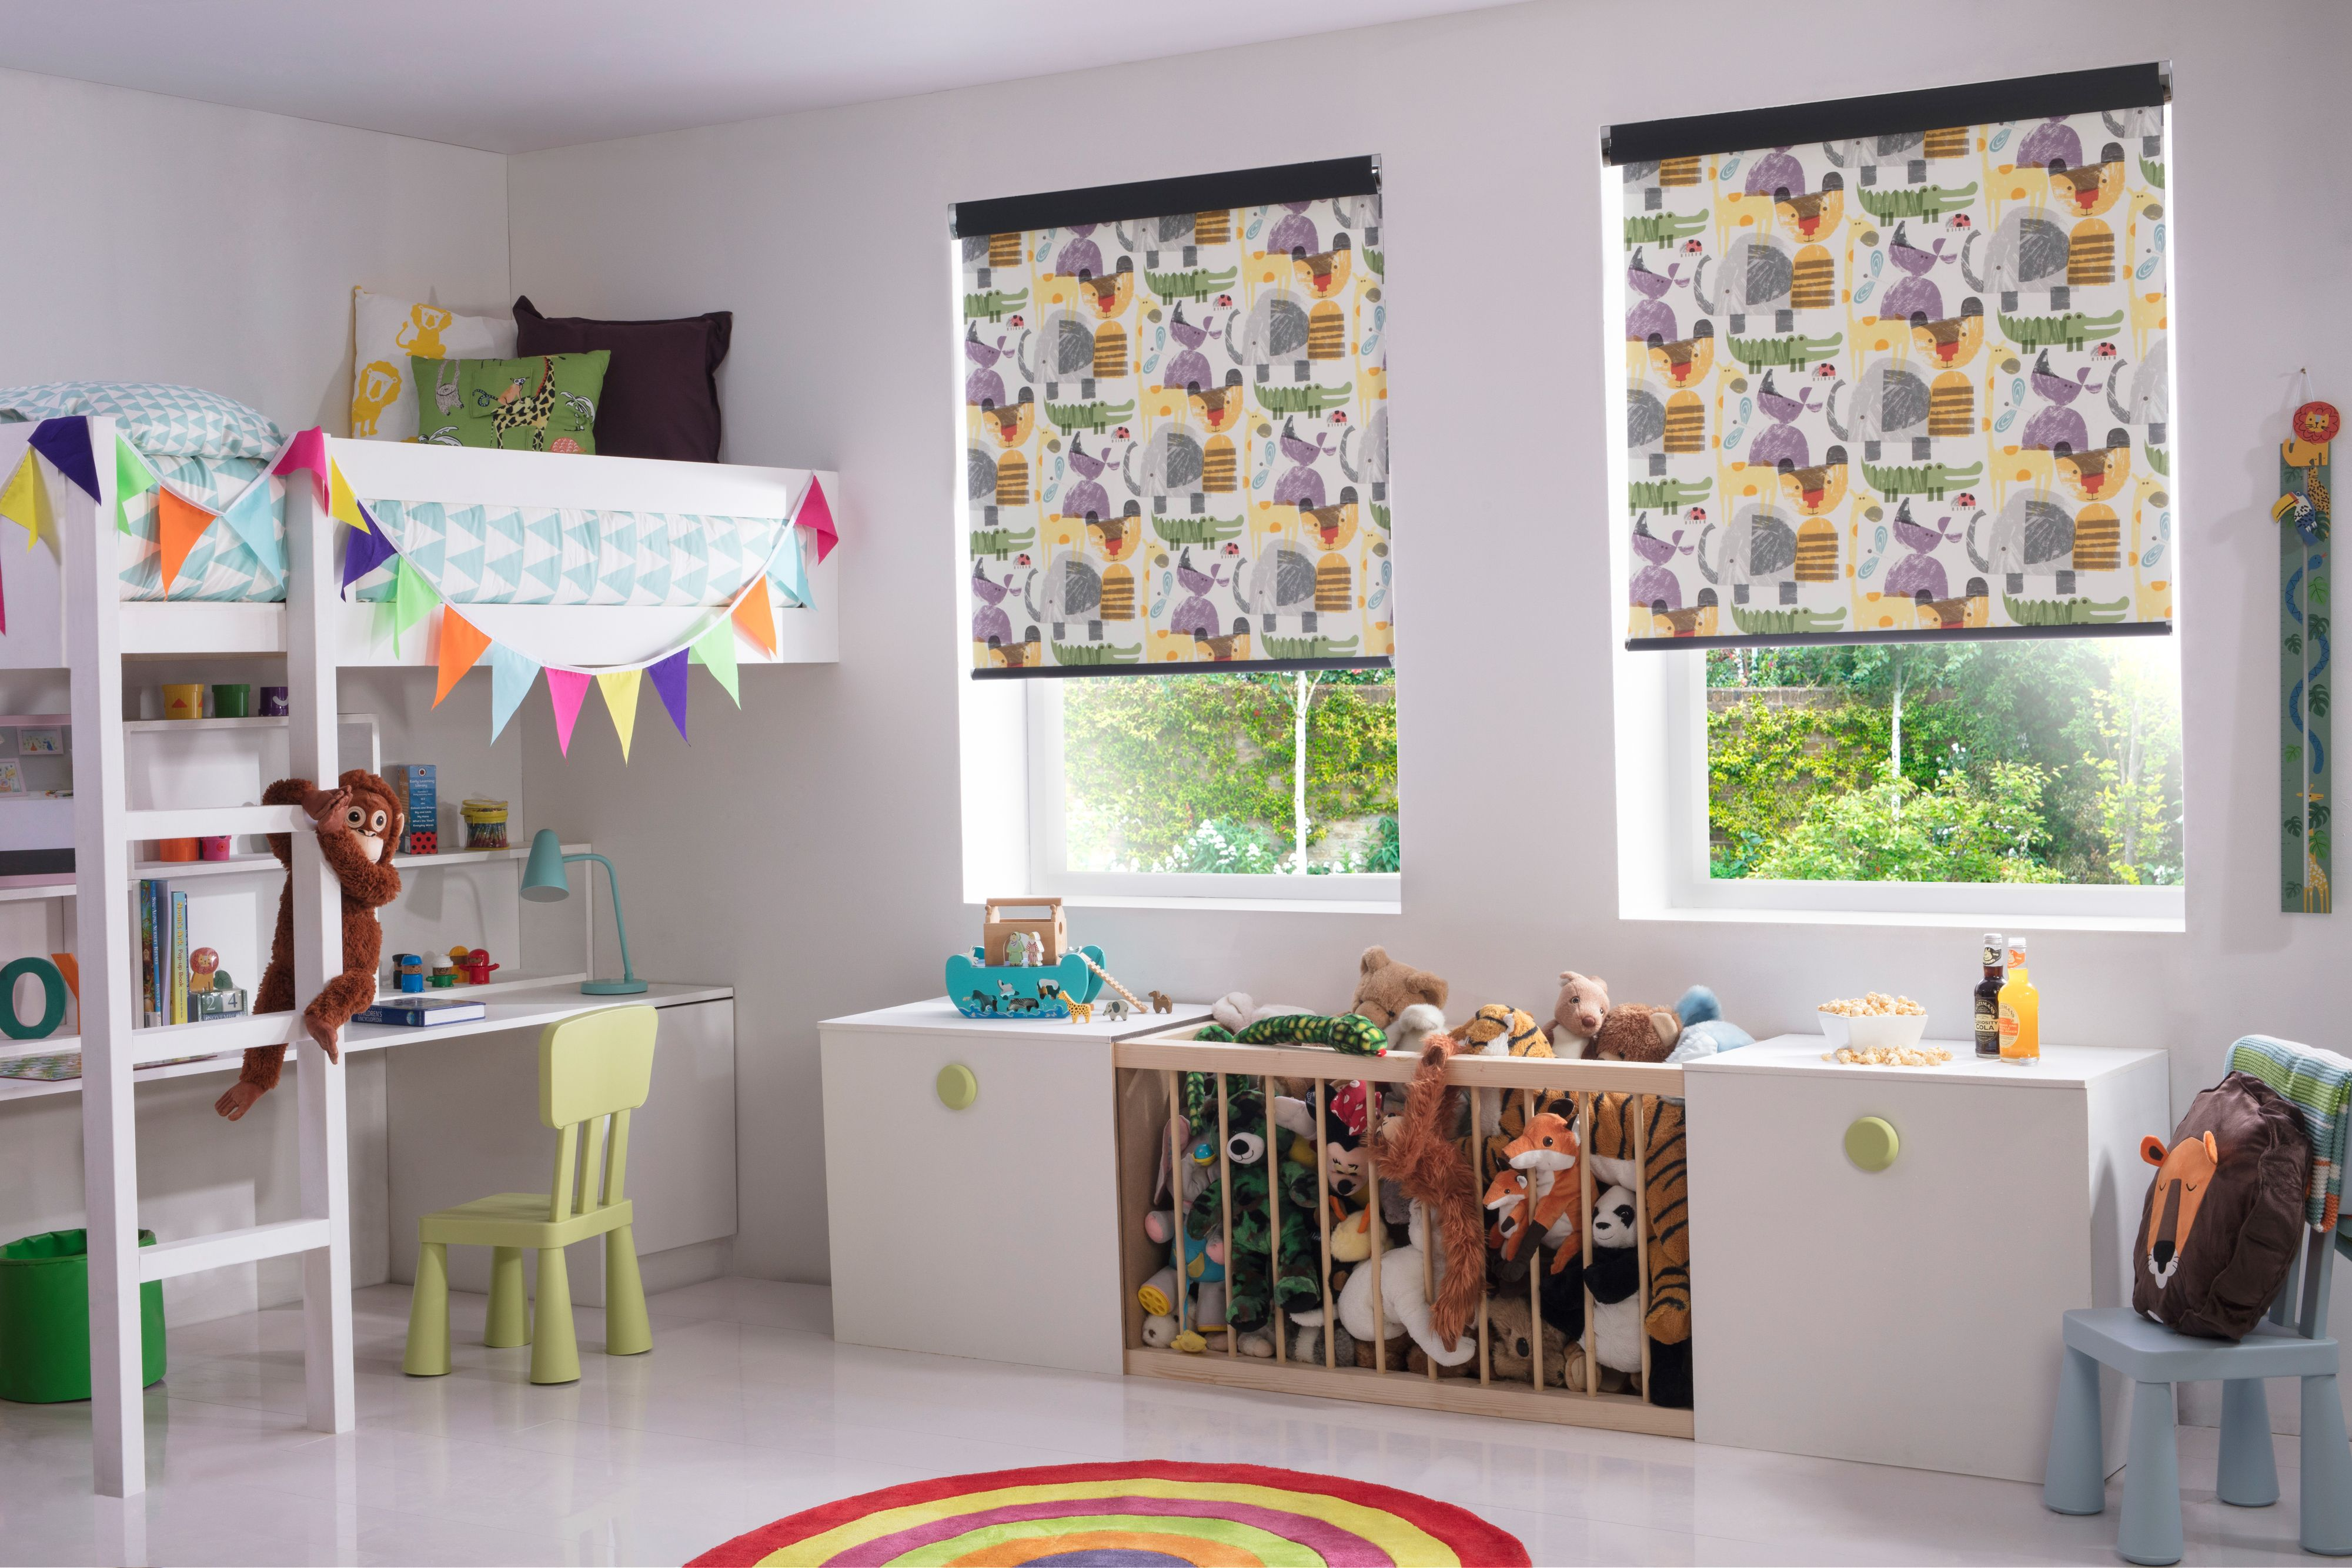 Style Studio Zootime Kids Roller Blinds Roller Blinds Children S Blinds Patterned Window Bli White Blinds Kids Bedroom Inspiration Bedroom Decor Inspiration